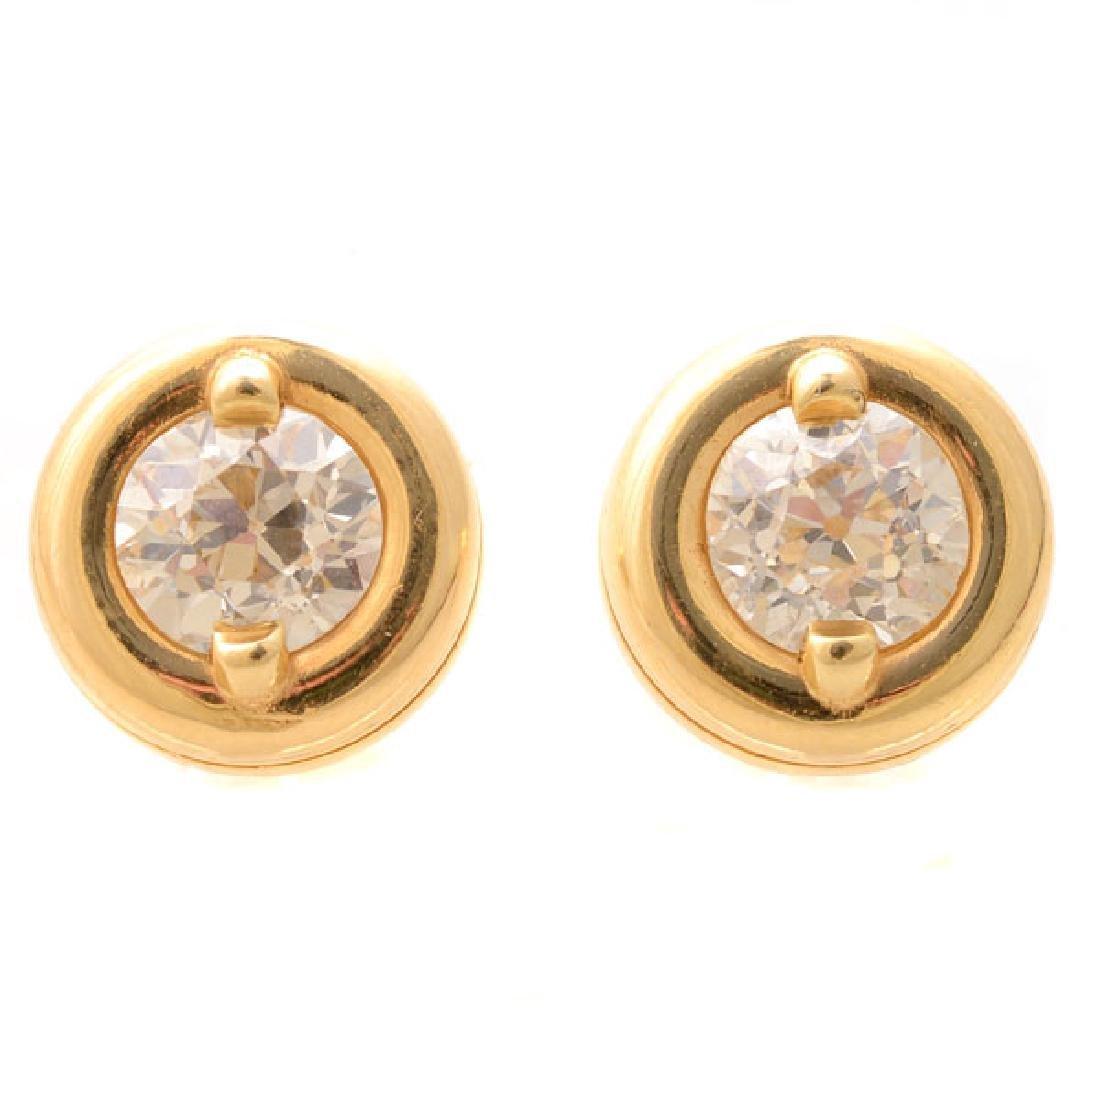 Pair of Diamond, 14k Yellow Gold Stud Earrings.